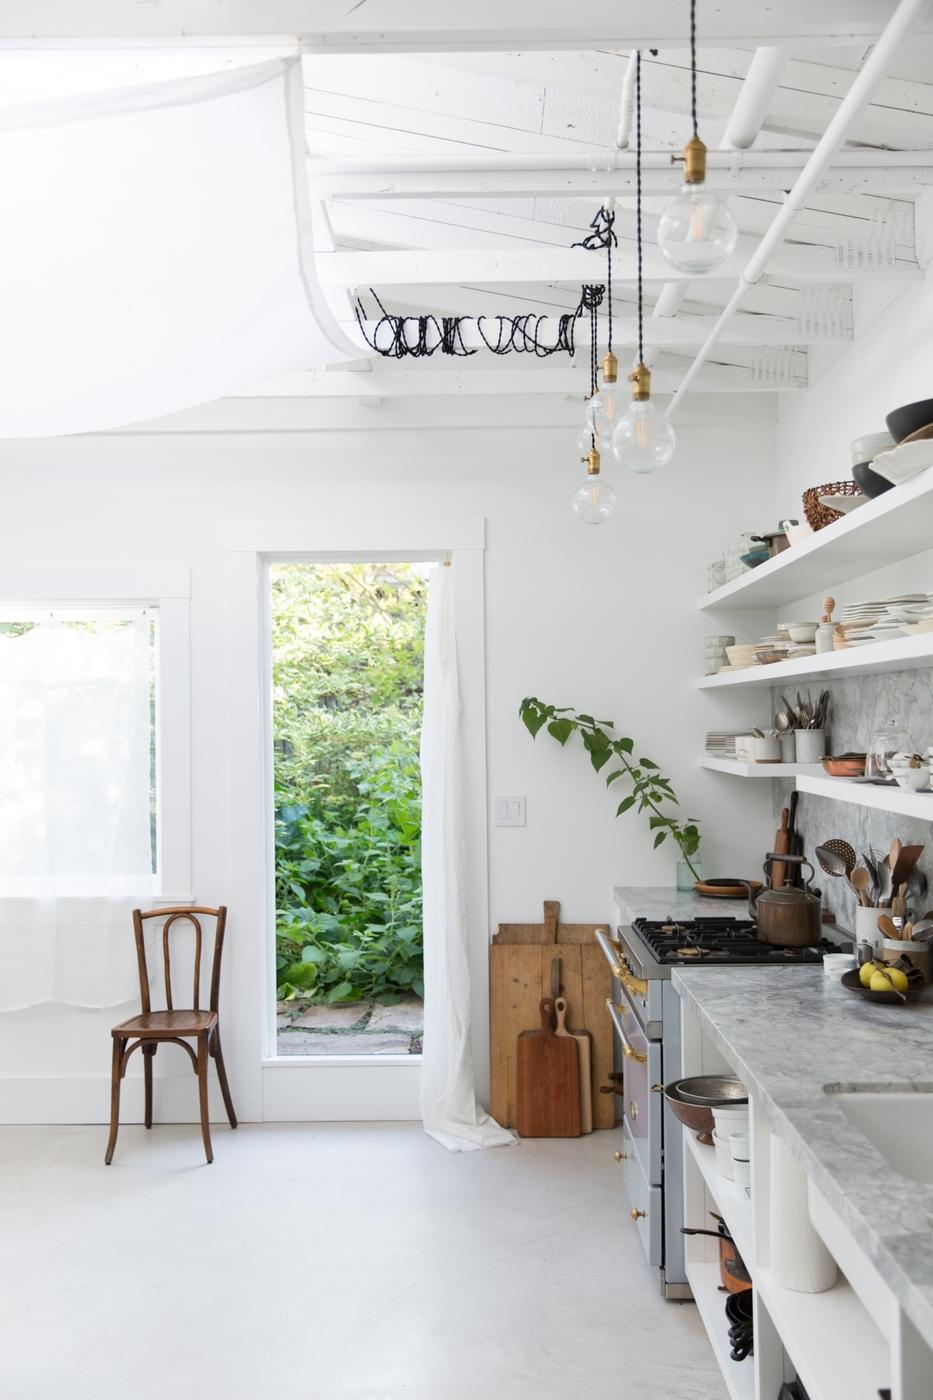 erin-scott-photo-studio-kitchen-doorway-1466x2199.jpg